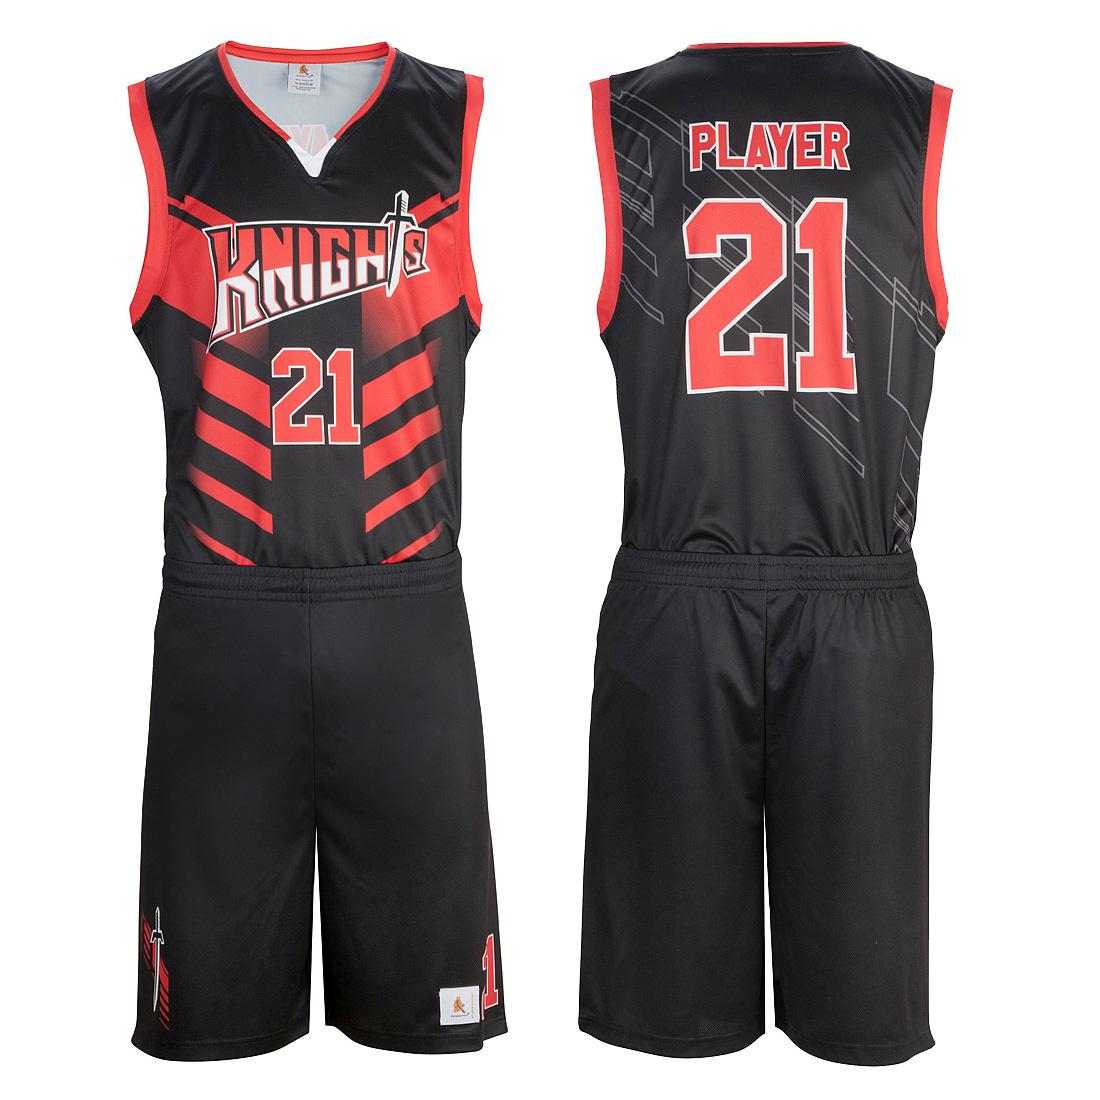 8a857915a08 2018 JFC China Cheap Manufacturer Wholesale Youth Basketball Uniform Sets